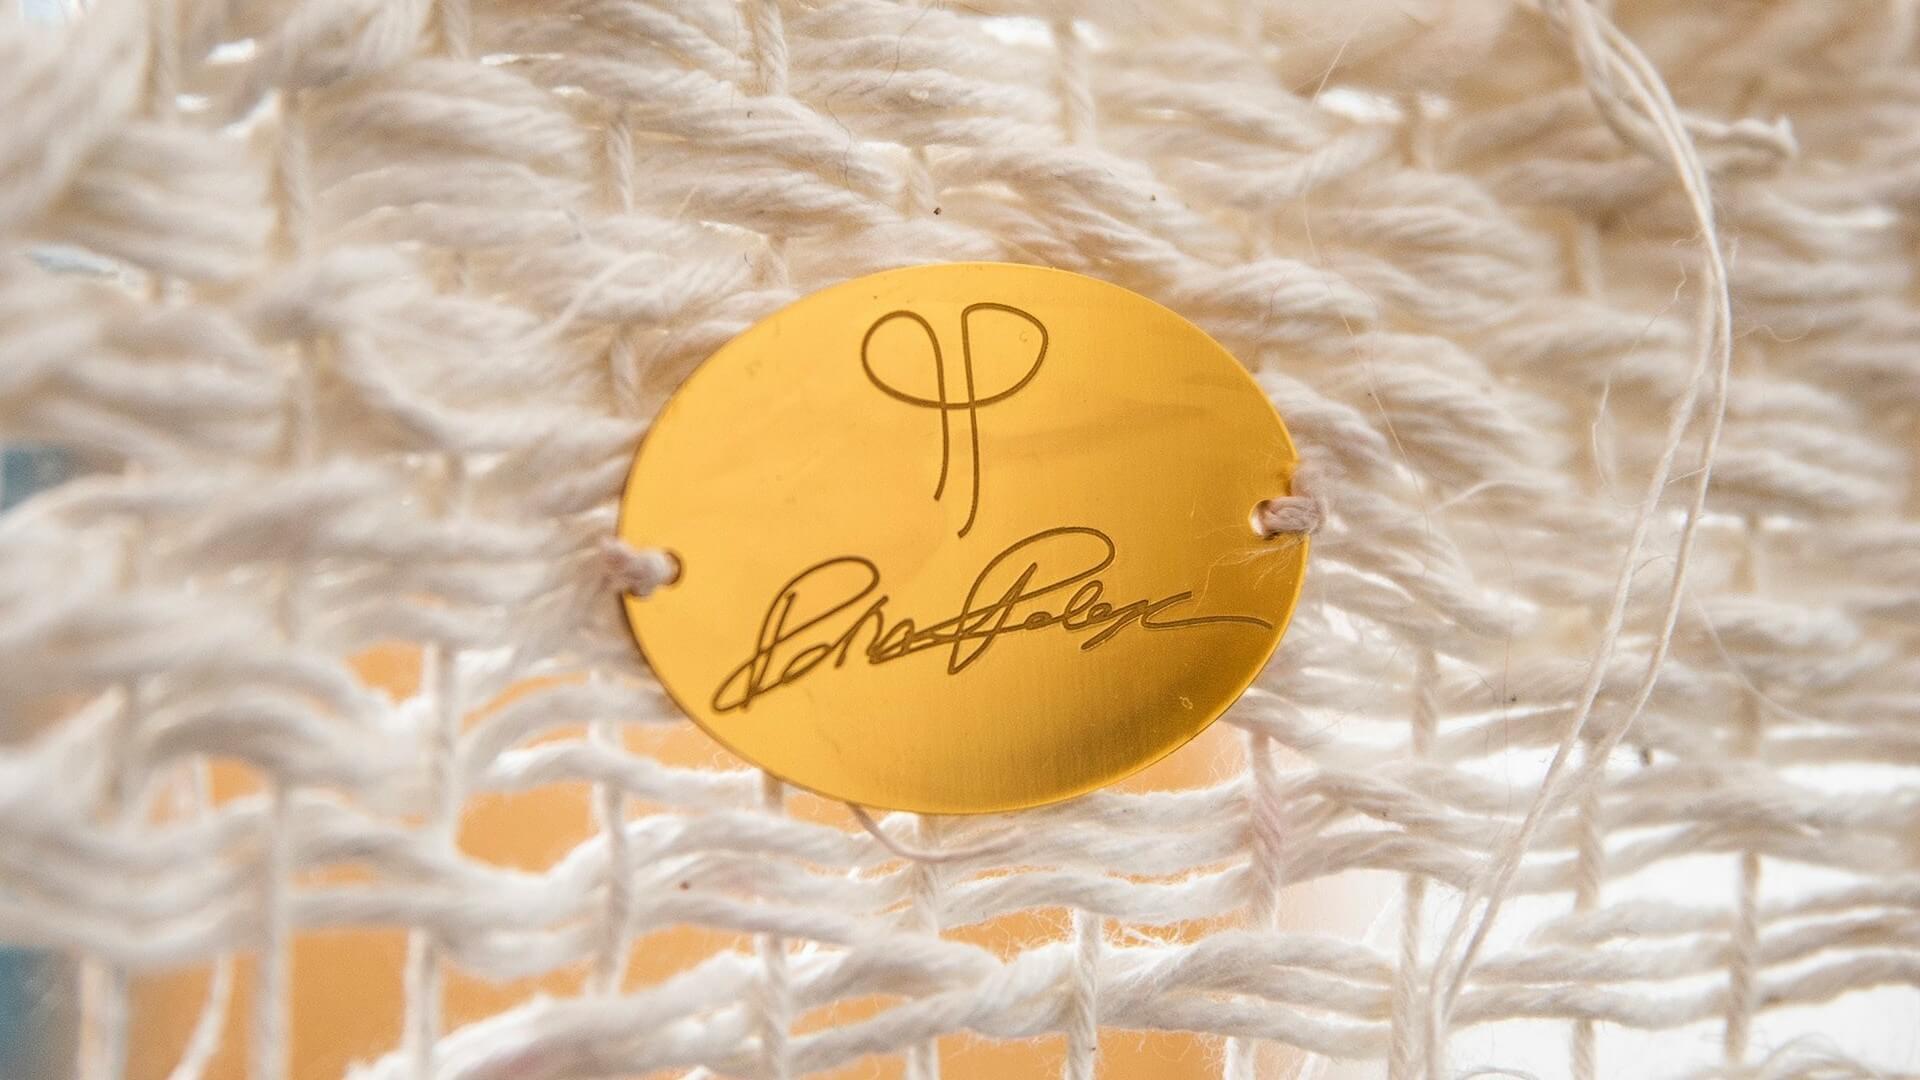 Patrizia-Polese-Textil-Art-Fiber-tapestries-details-sl